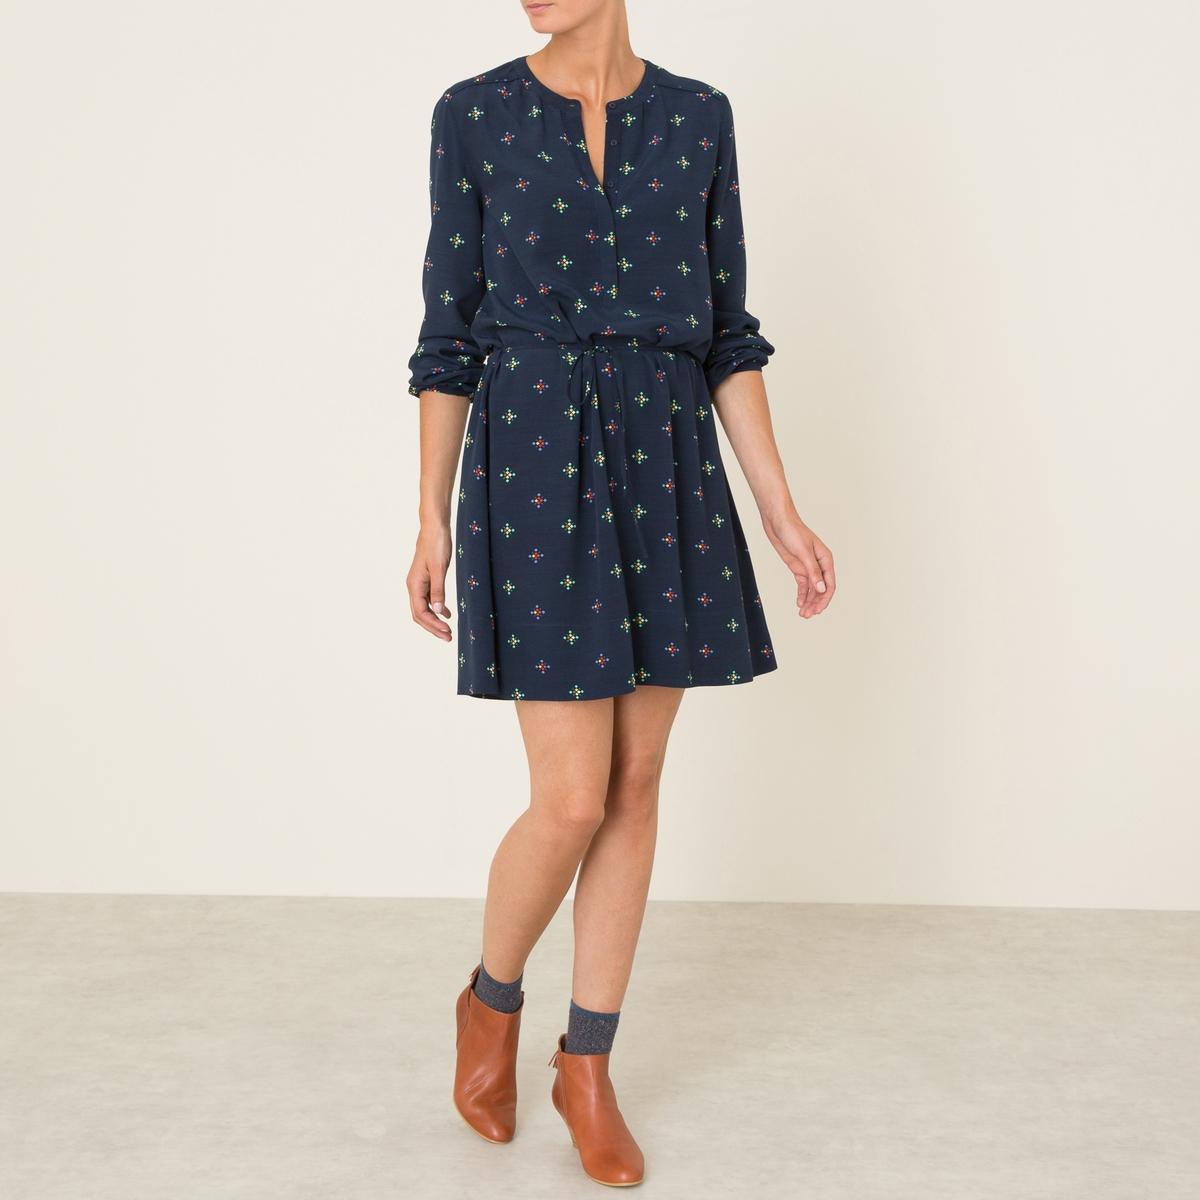 Платье FLAVIEСостав и описание :Материал : 100% вискозаМарка : ATHE VANESSA BRUNO<br><br>Цвет: темно-синий